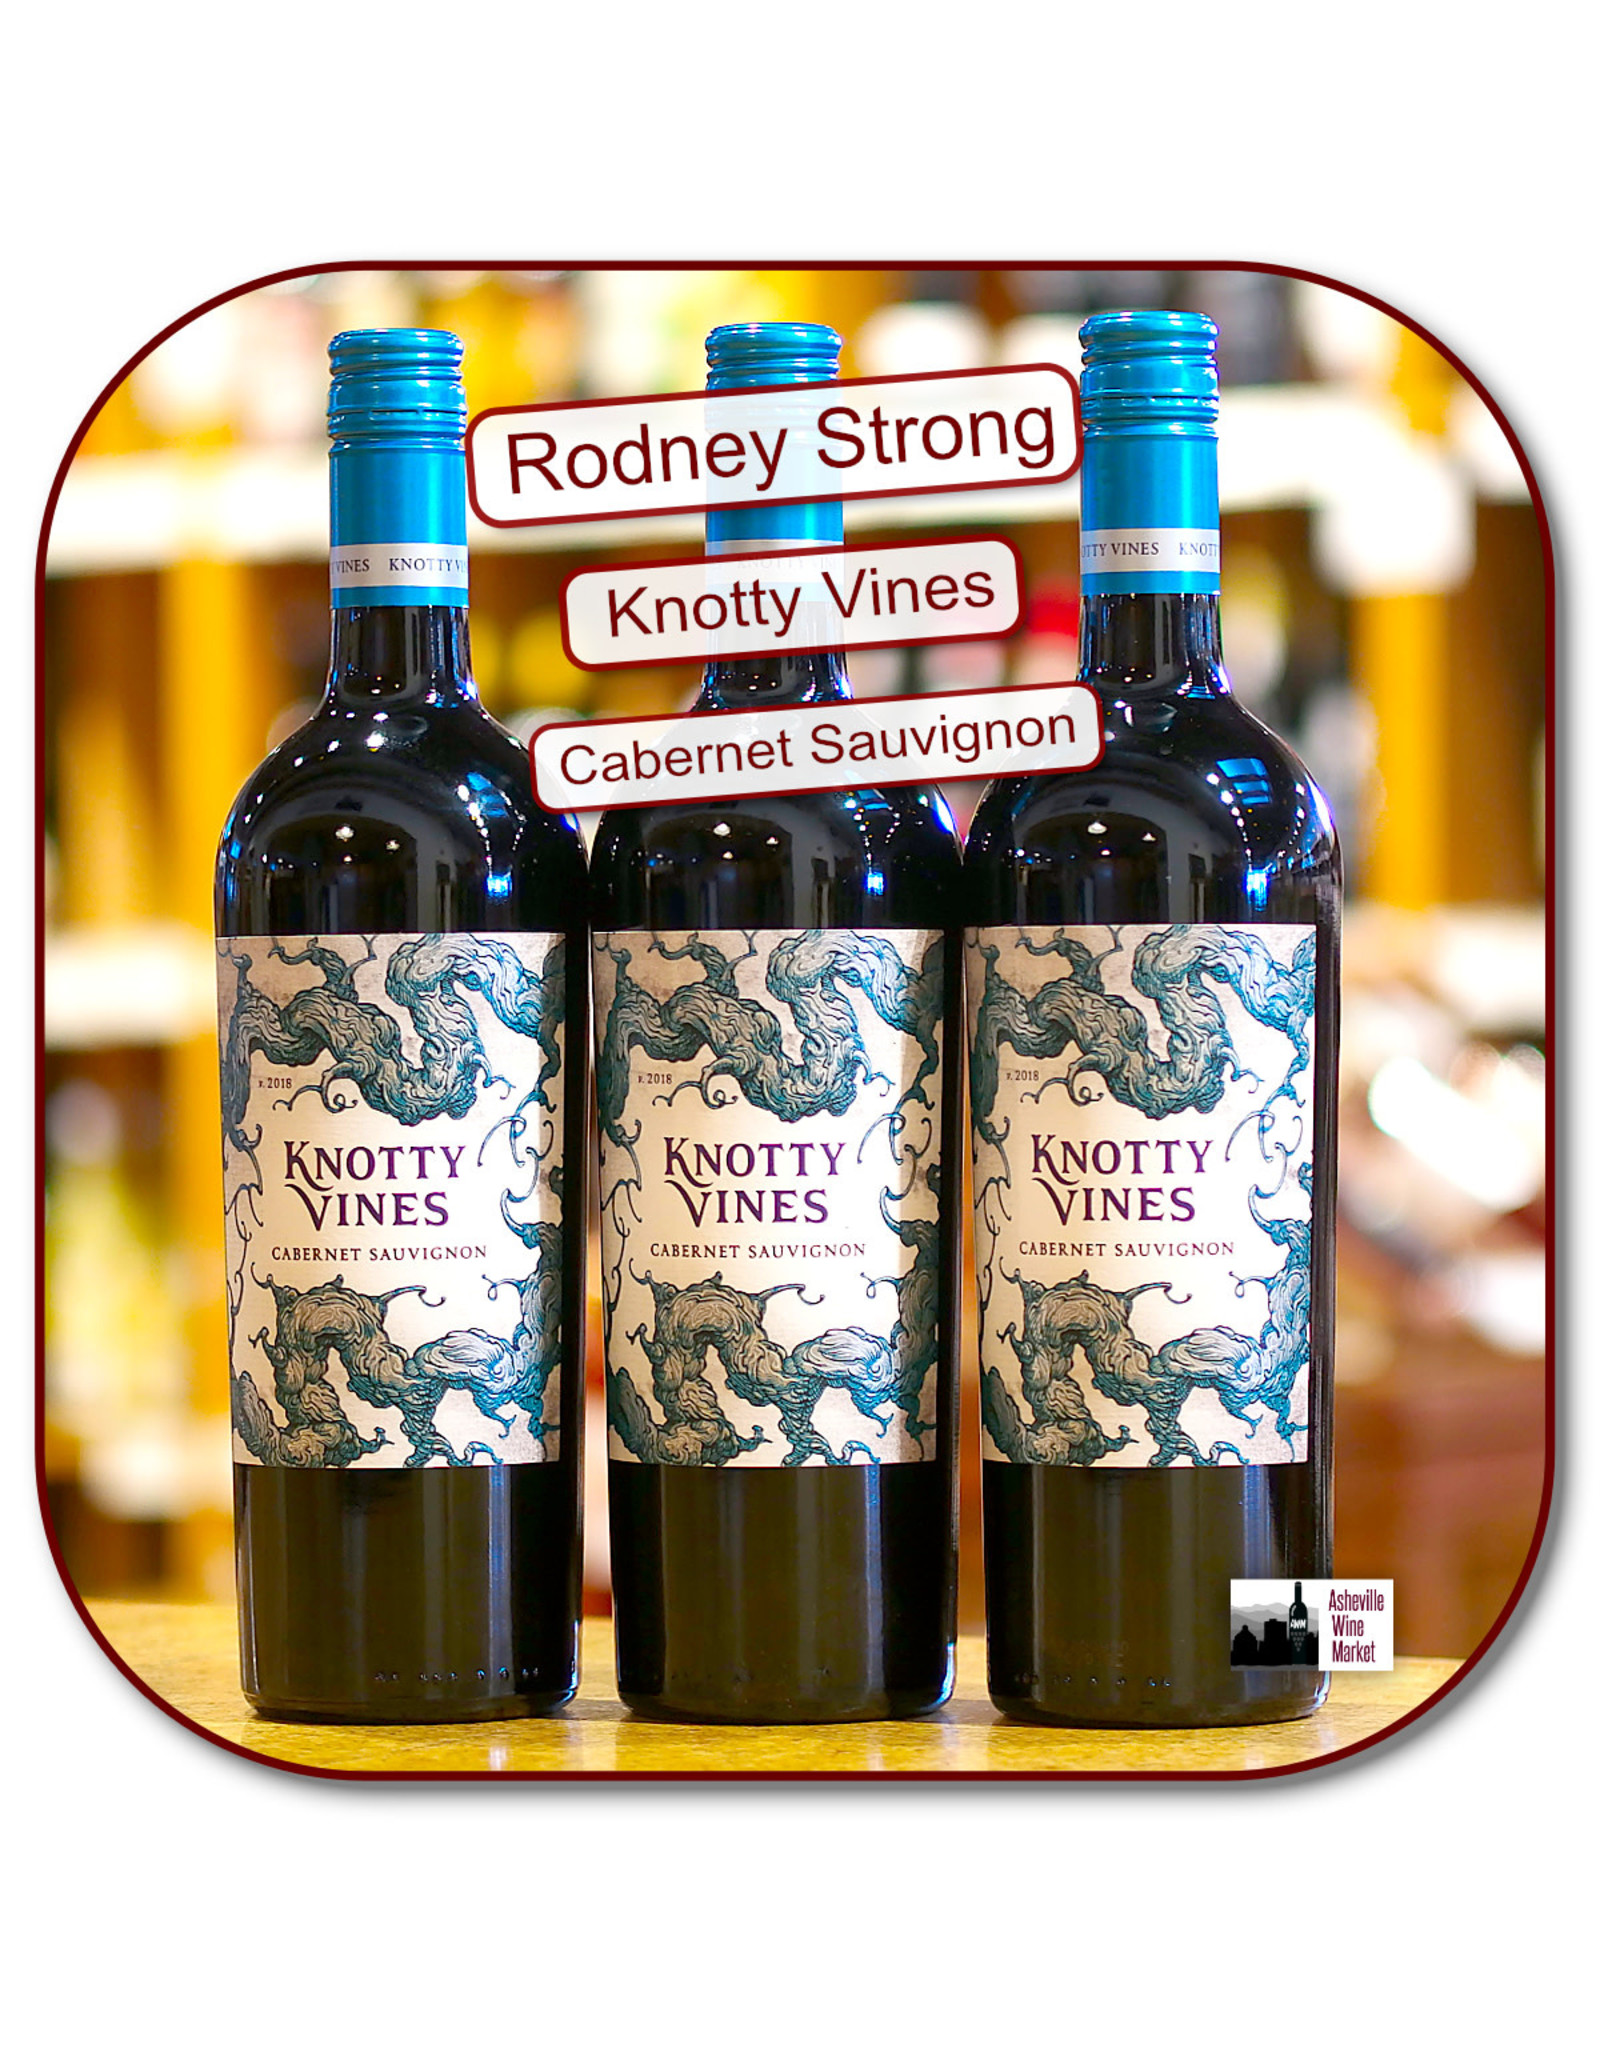 Cabernet Sauvignon Rodney Strong Knotty Vines Cabernet 18